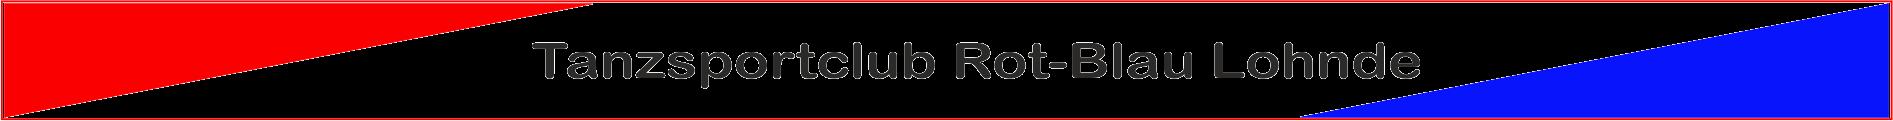 Tanzsportclub Rot-Blau Lohnde